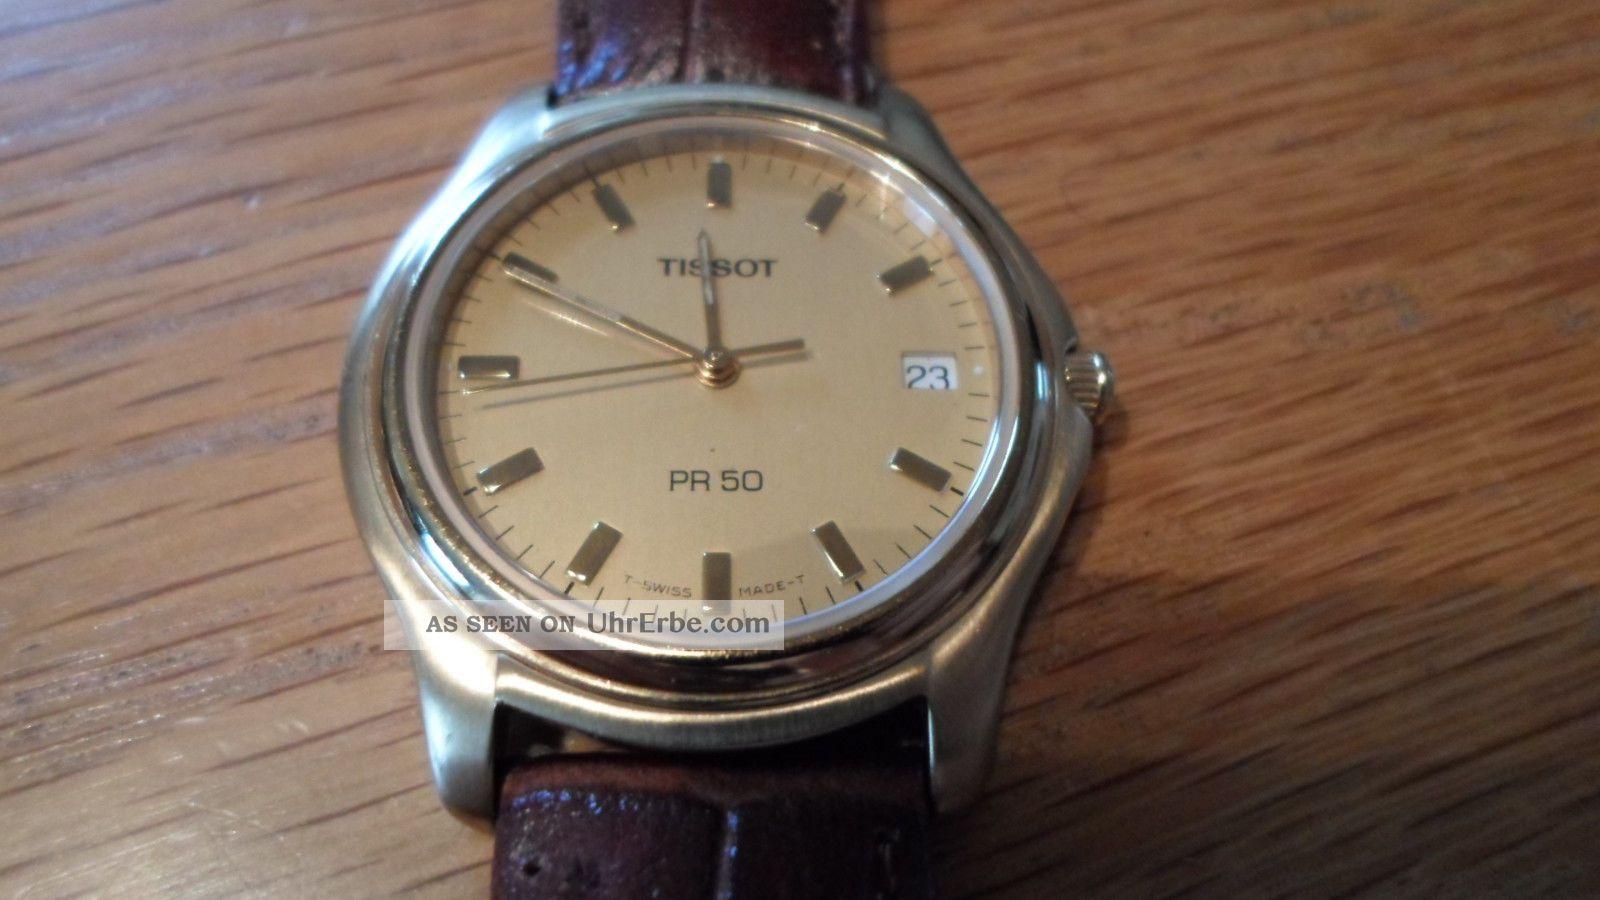 Tissot 1863 Pr 50 Uhr Armbanduhr Herren ° Schön° Armbanduhren Bild